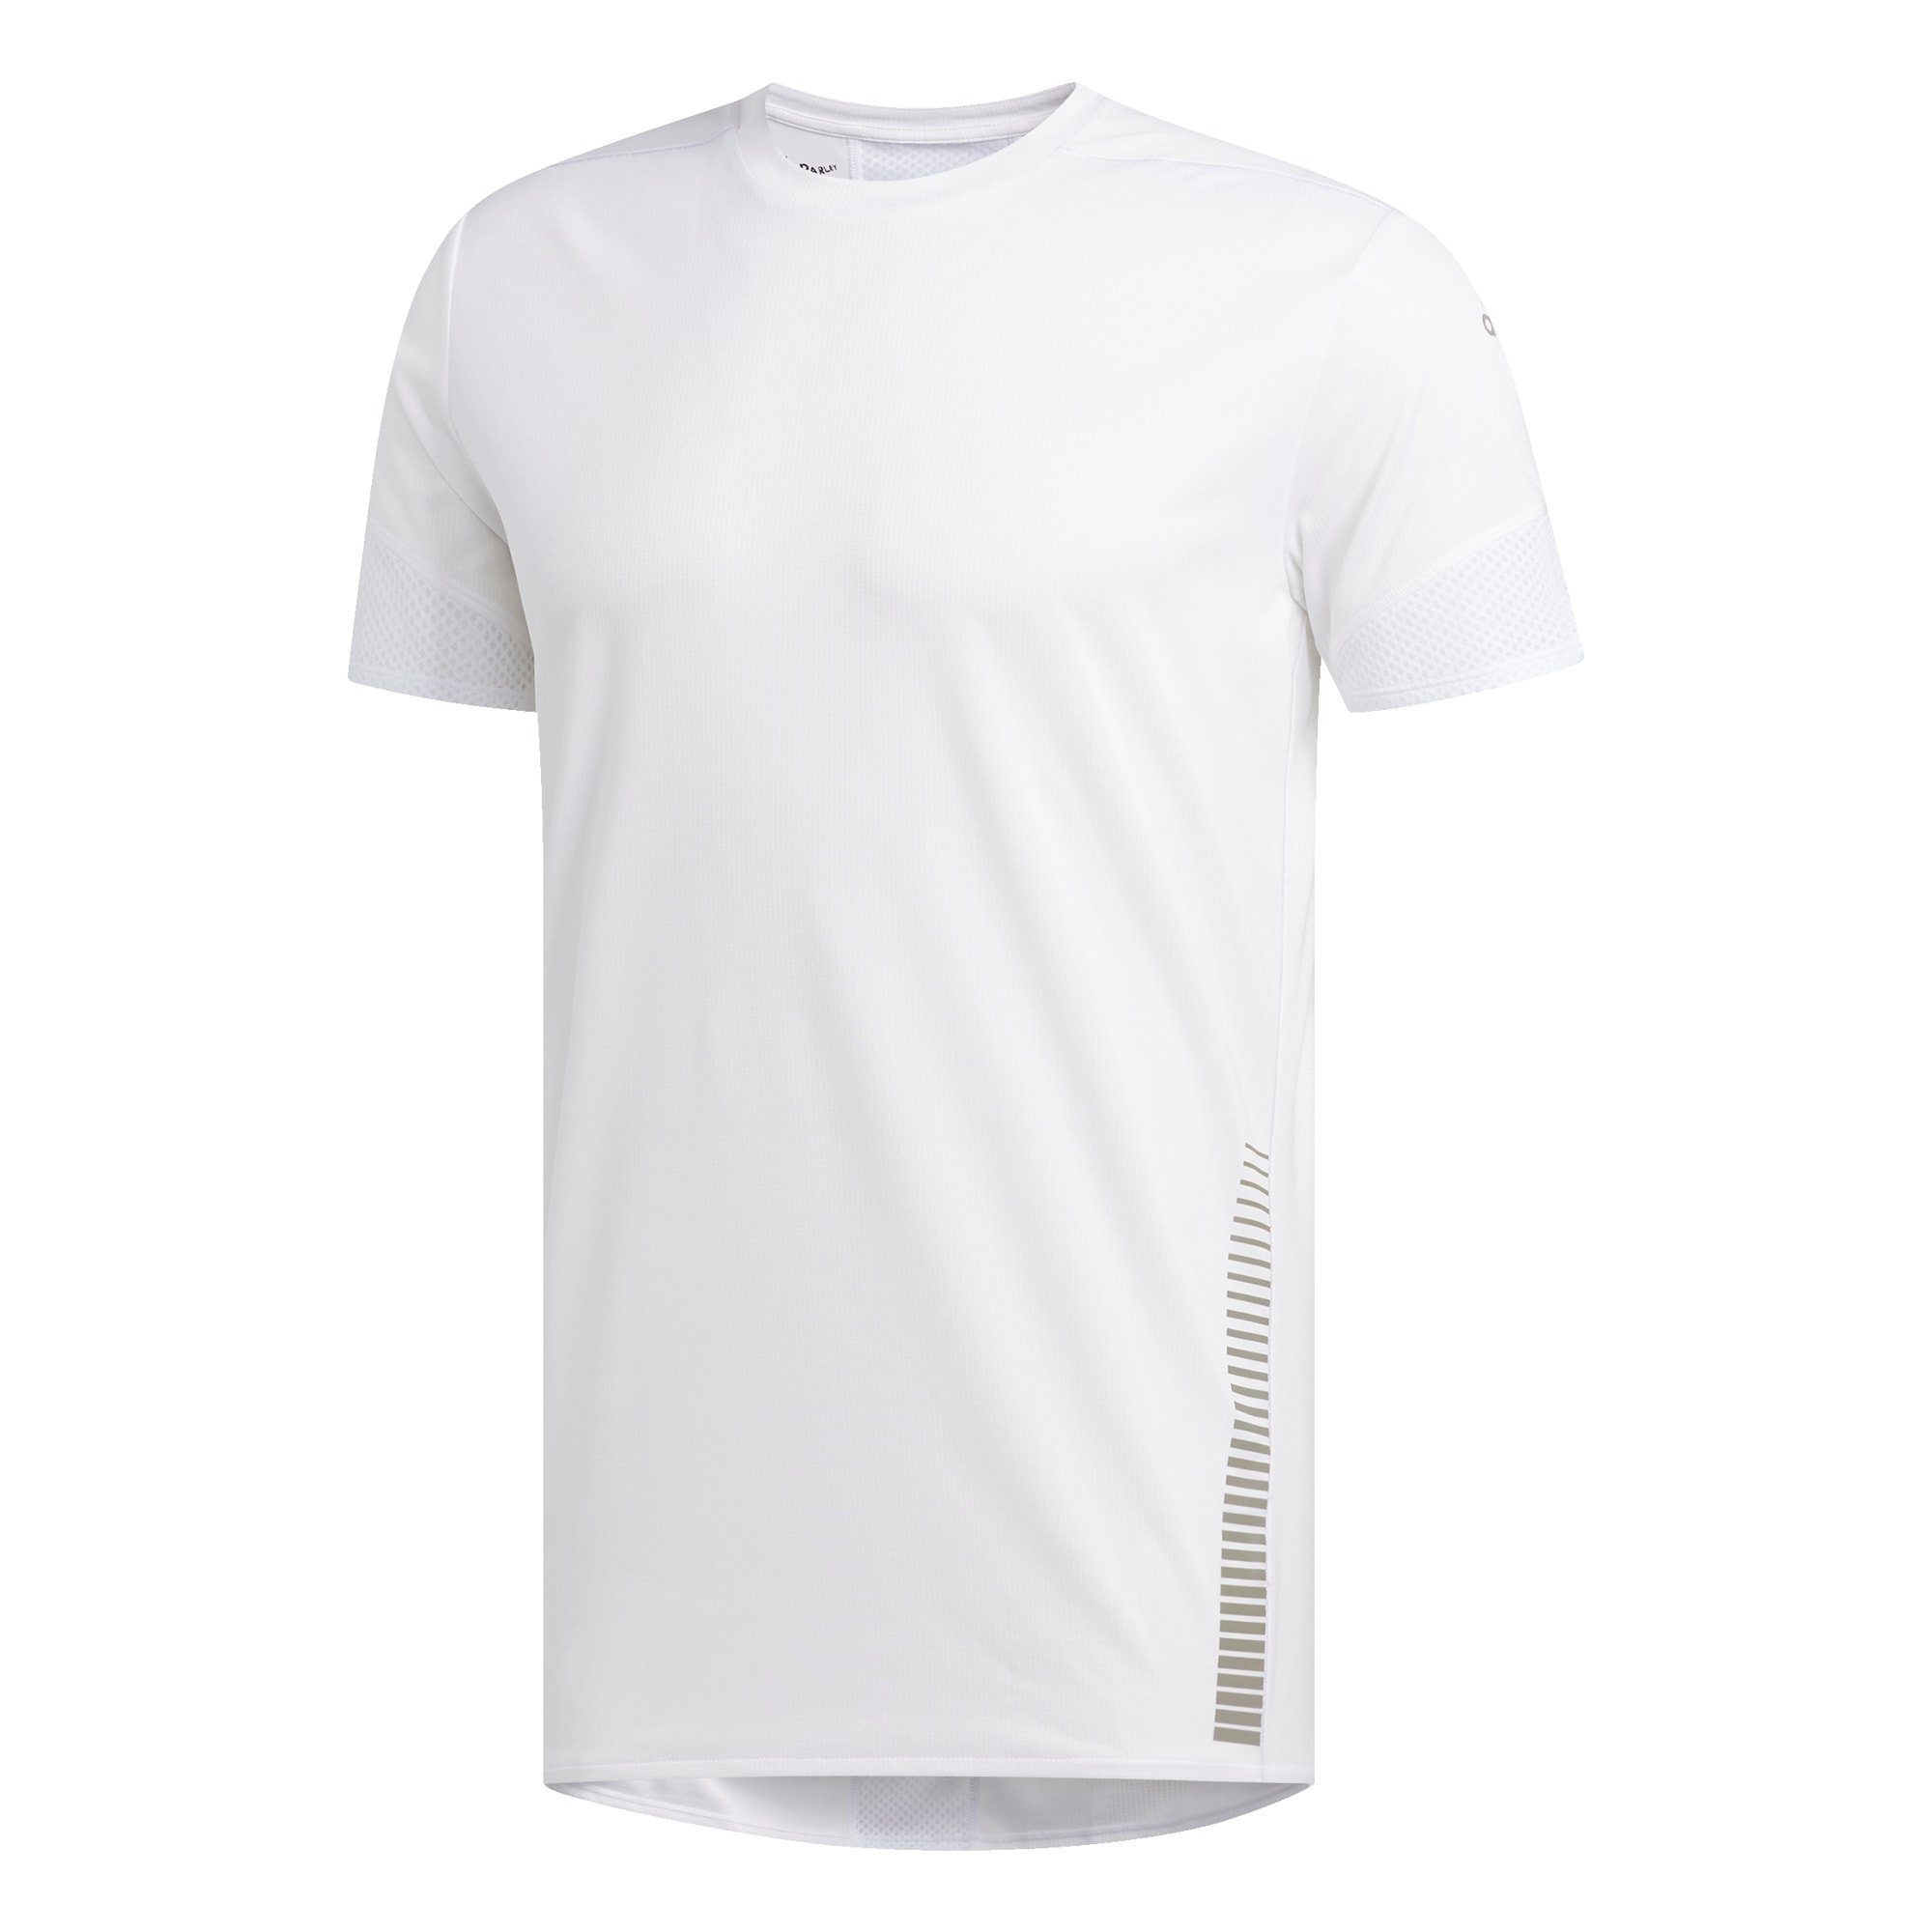 adidas Performance T Shirt »Parley 257 Rise Up N Run T Shirt« Supernova;Parley;RDY;Clima online kaufen | OTTO